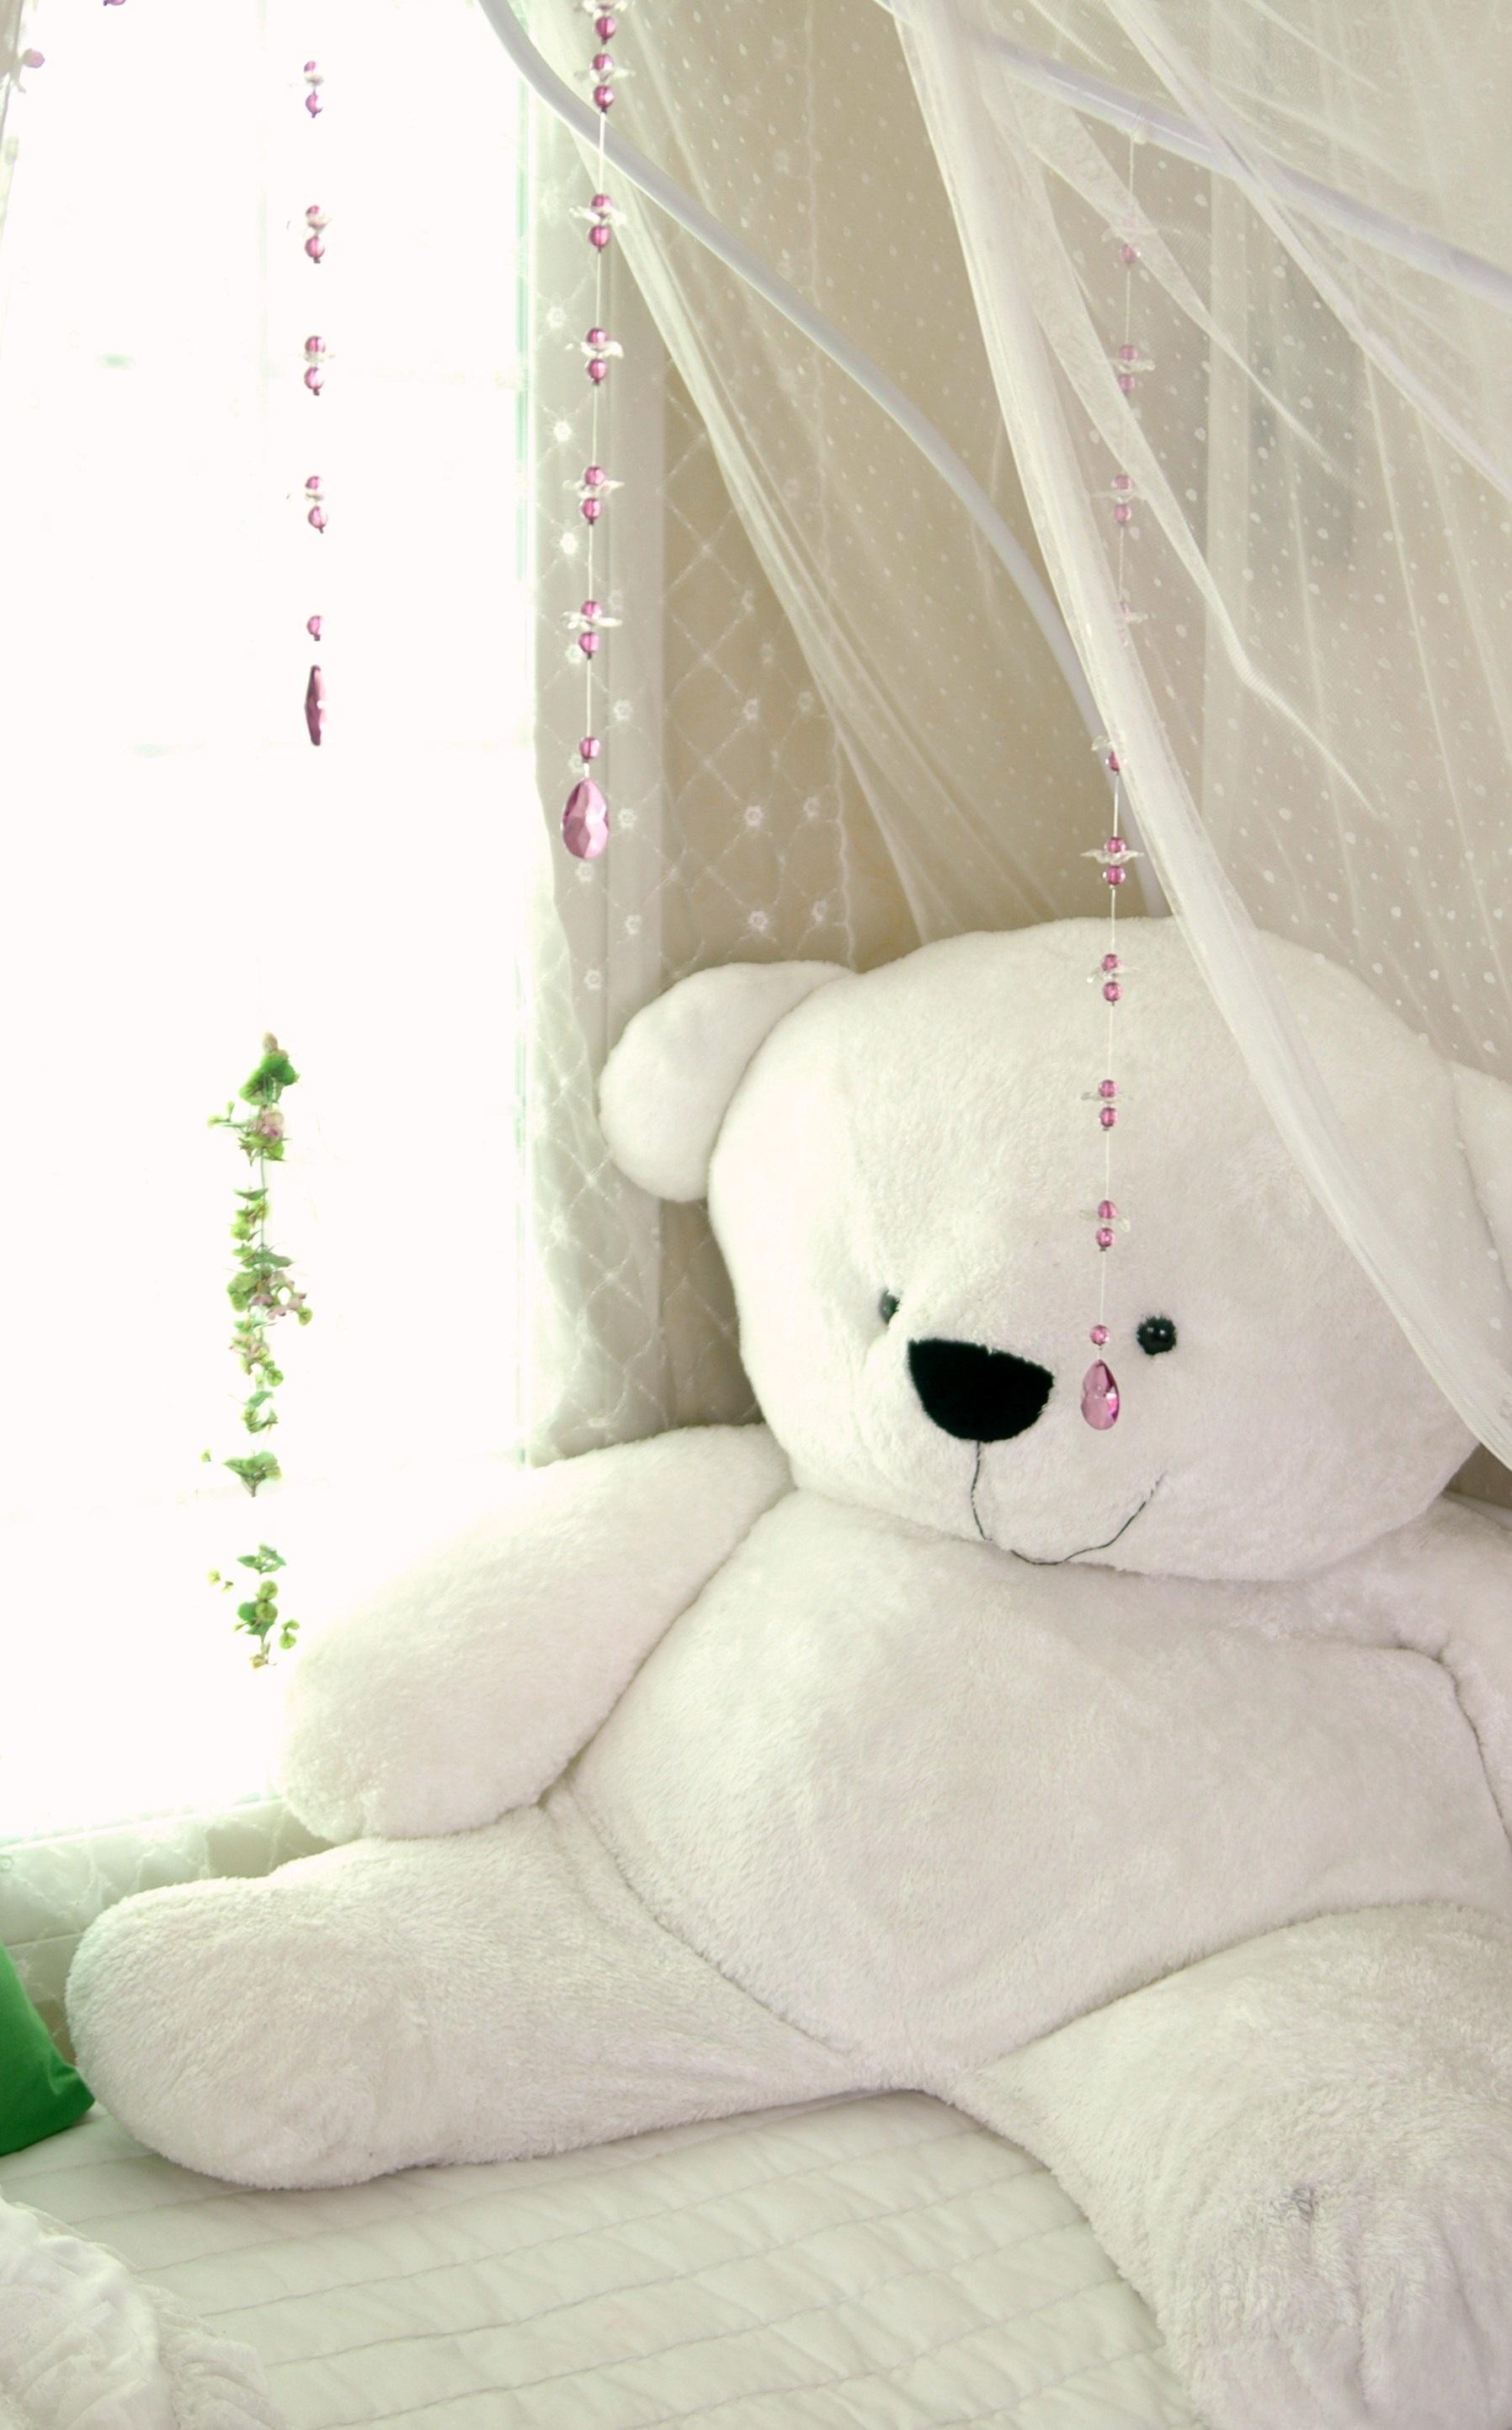 Fotos gratis : blanco, cortina, mueble, rosado, juguete, material ...